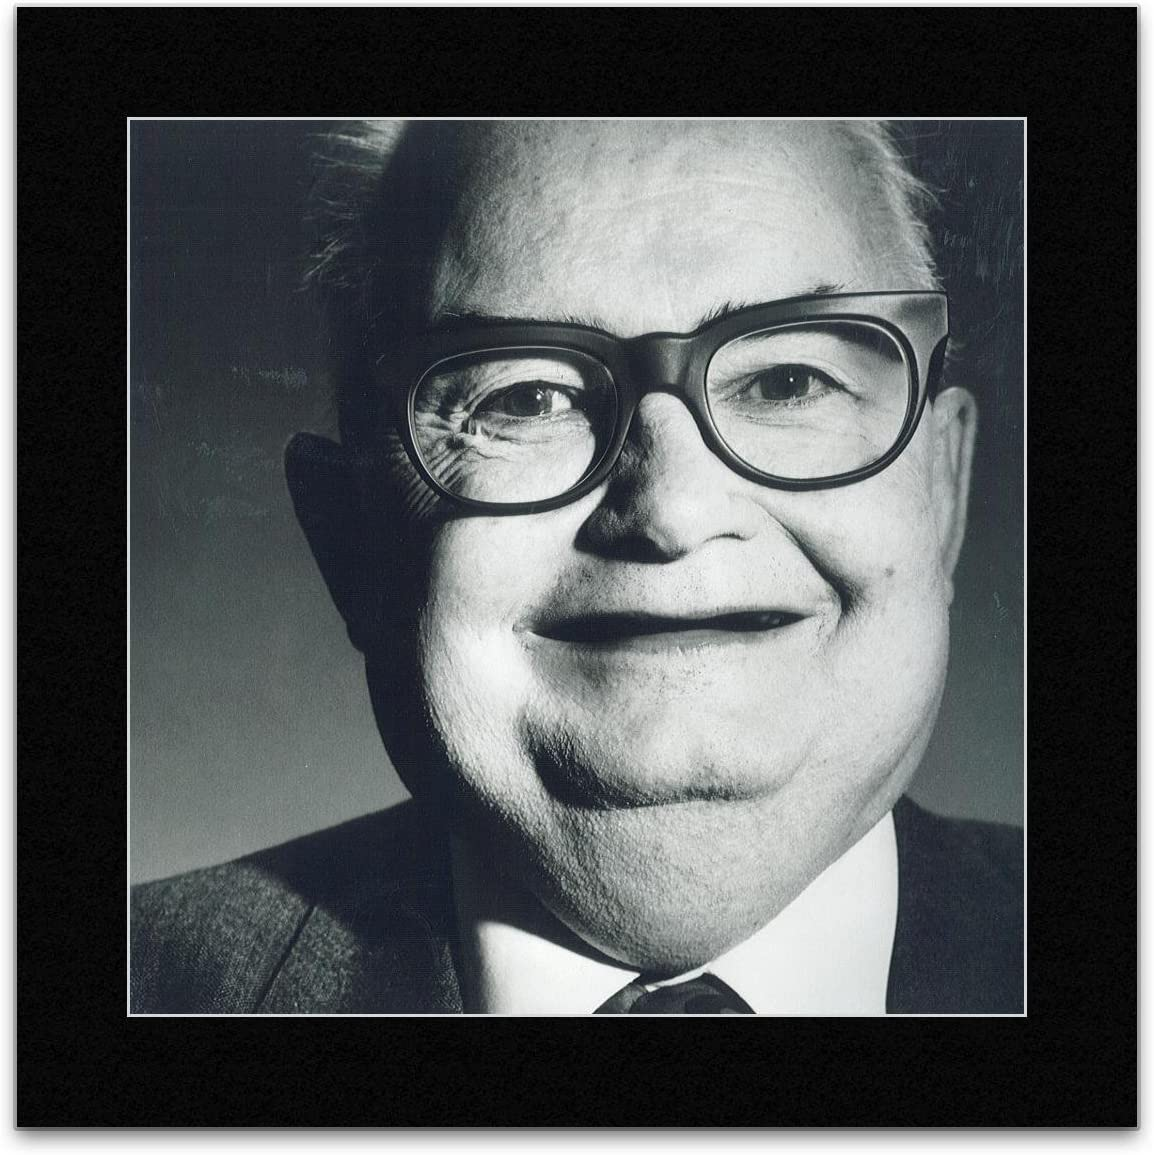 Larry Bud MELMAN - Glasses Mini Poster - 22.5x22.5cm: Amazon.ca ...